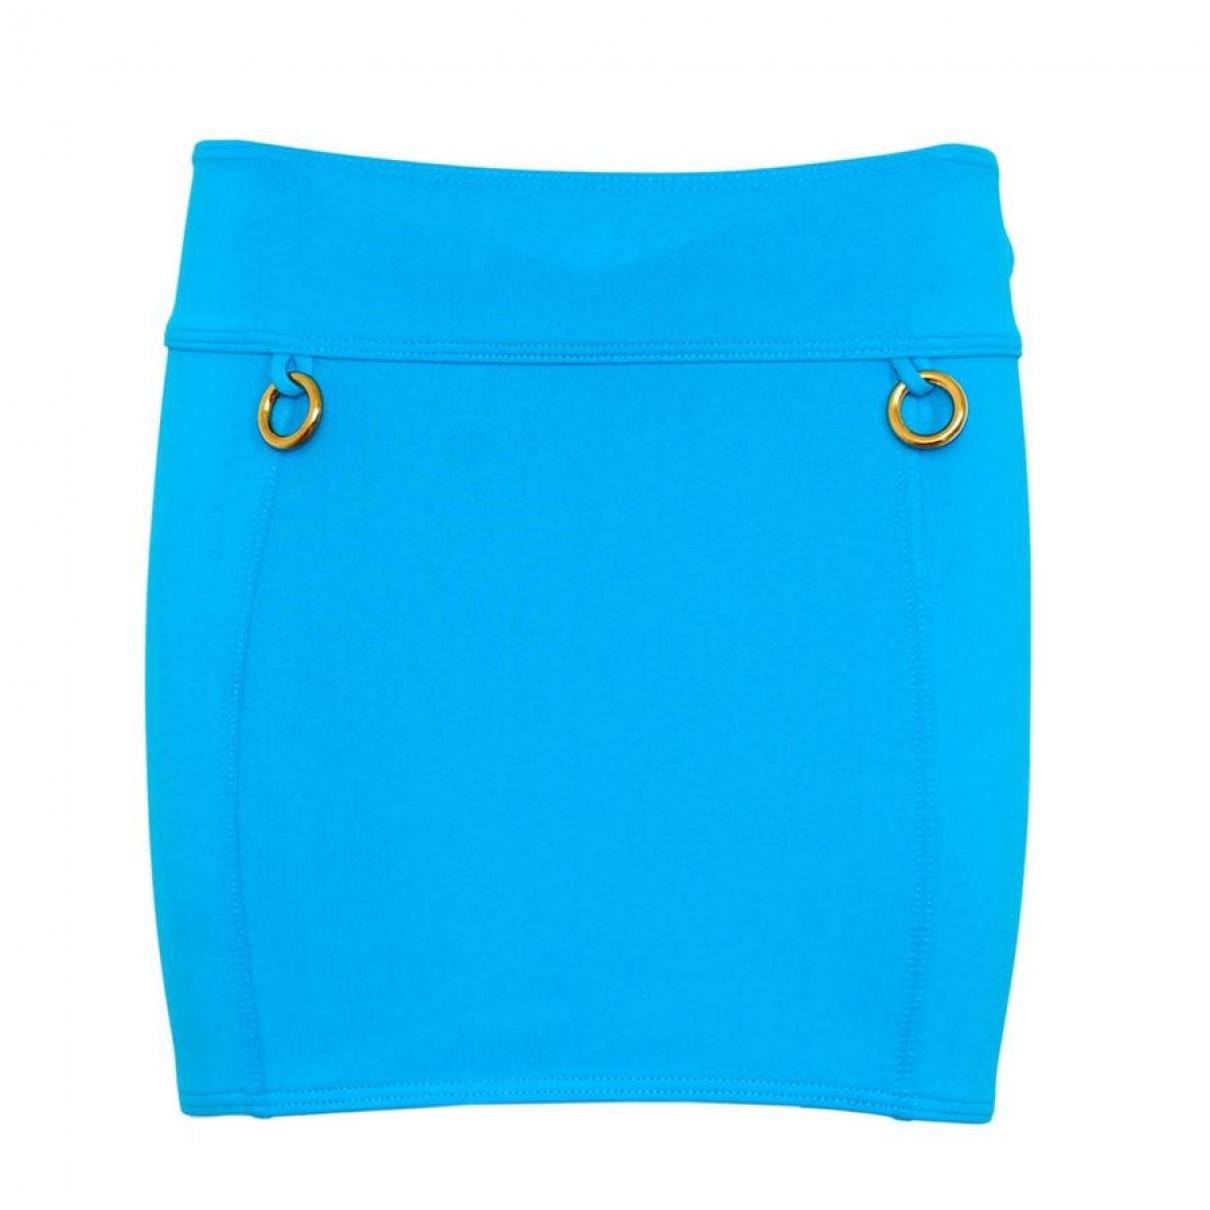 Hermes - Jupe   pour femme - bleu